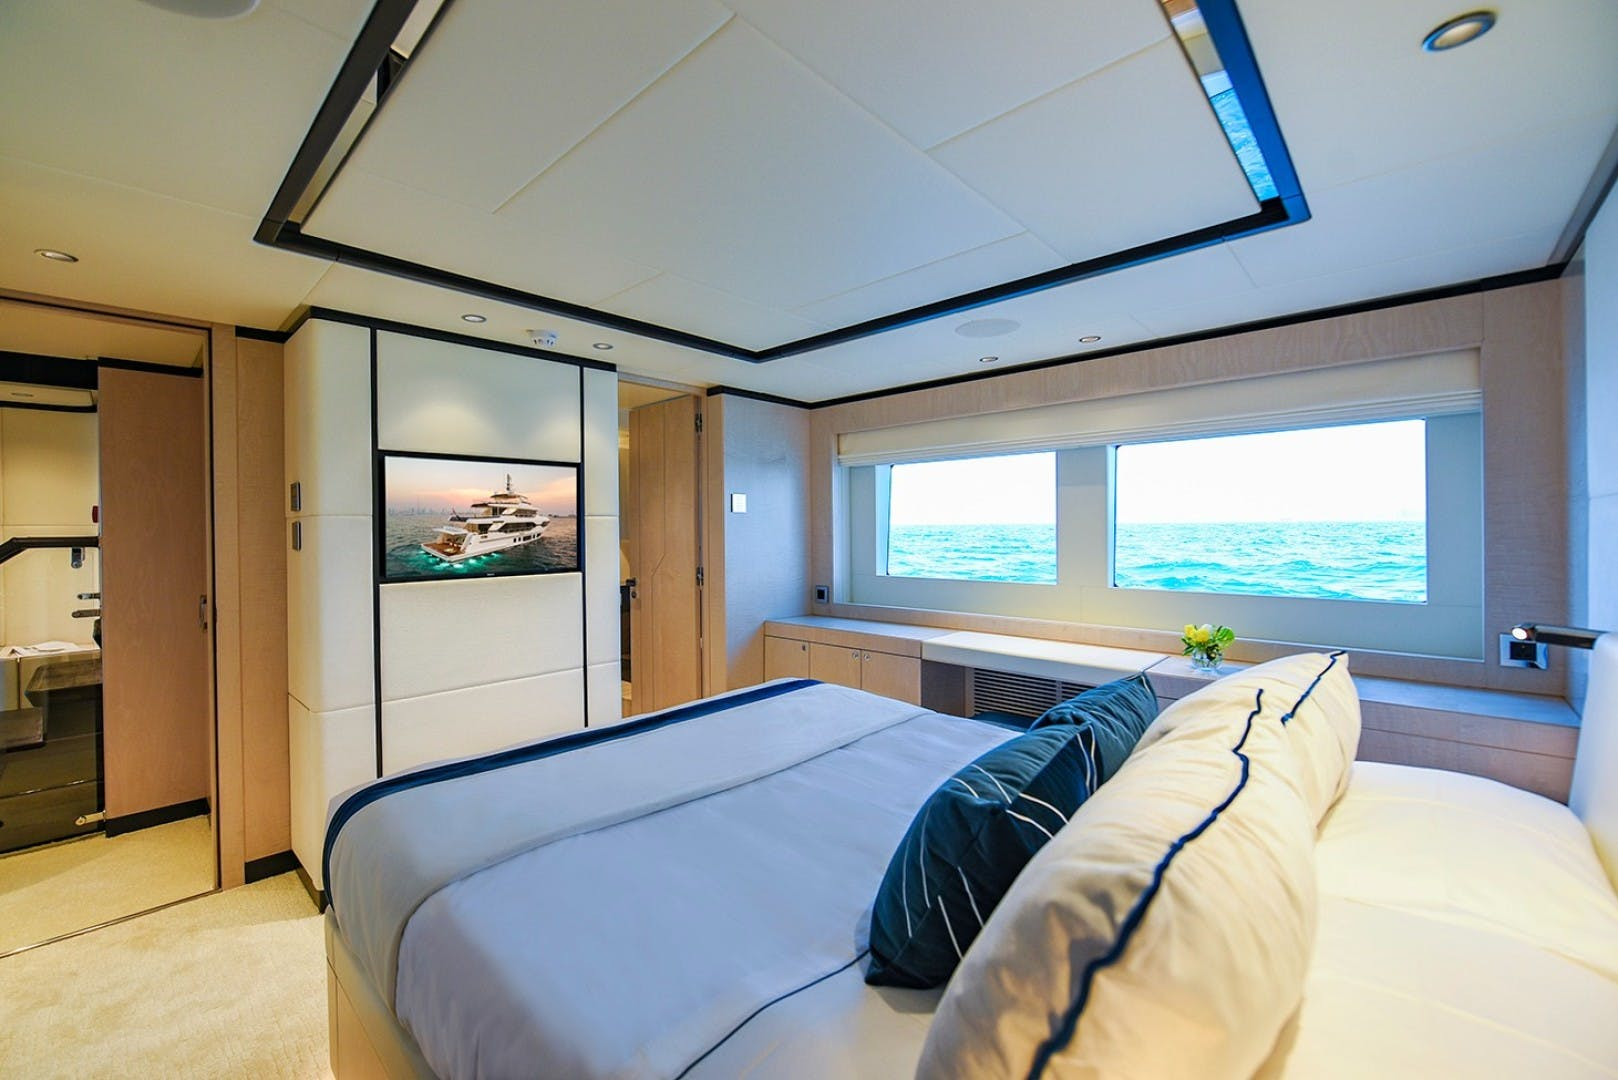 2022 Majesty Yachts 120' Raised Pilothouse MAJESTY 120 | Picture 4 of 39